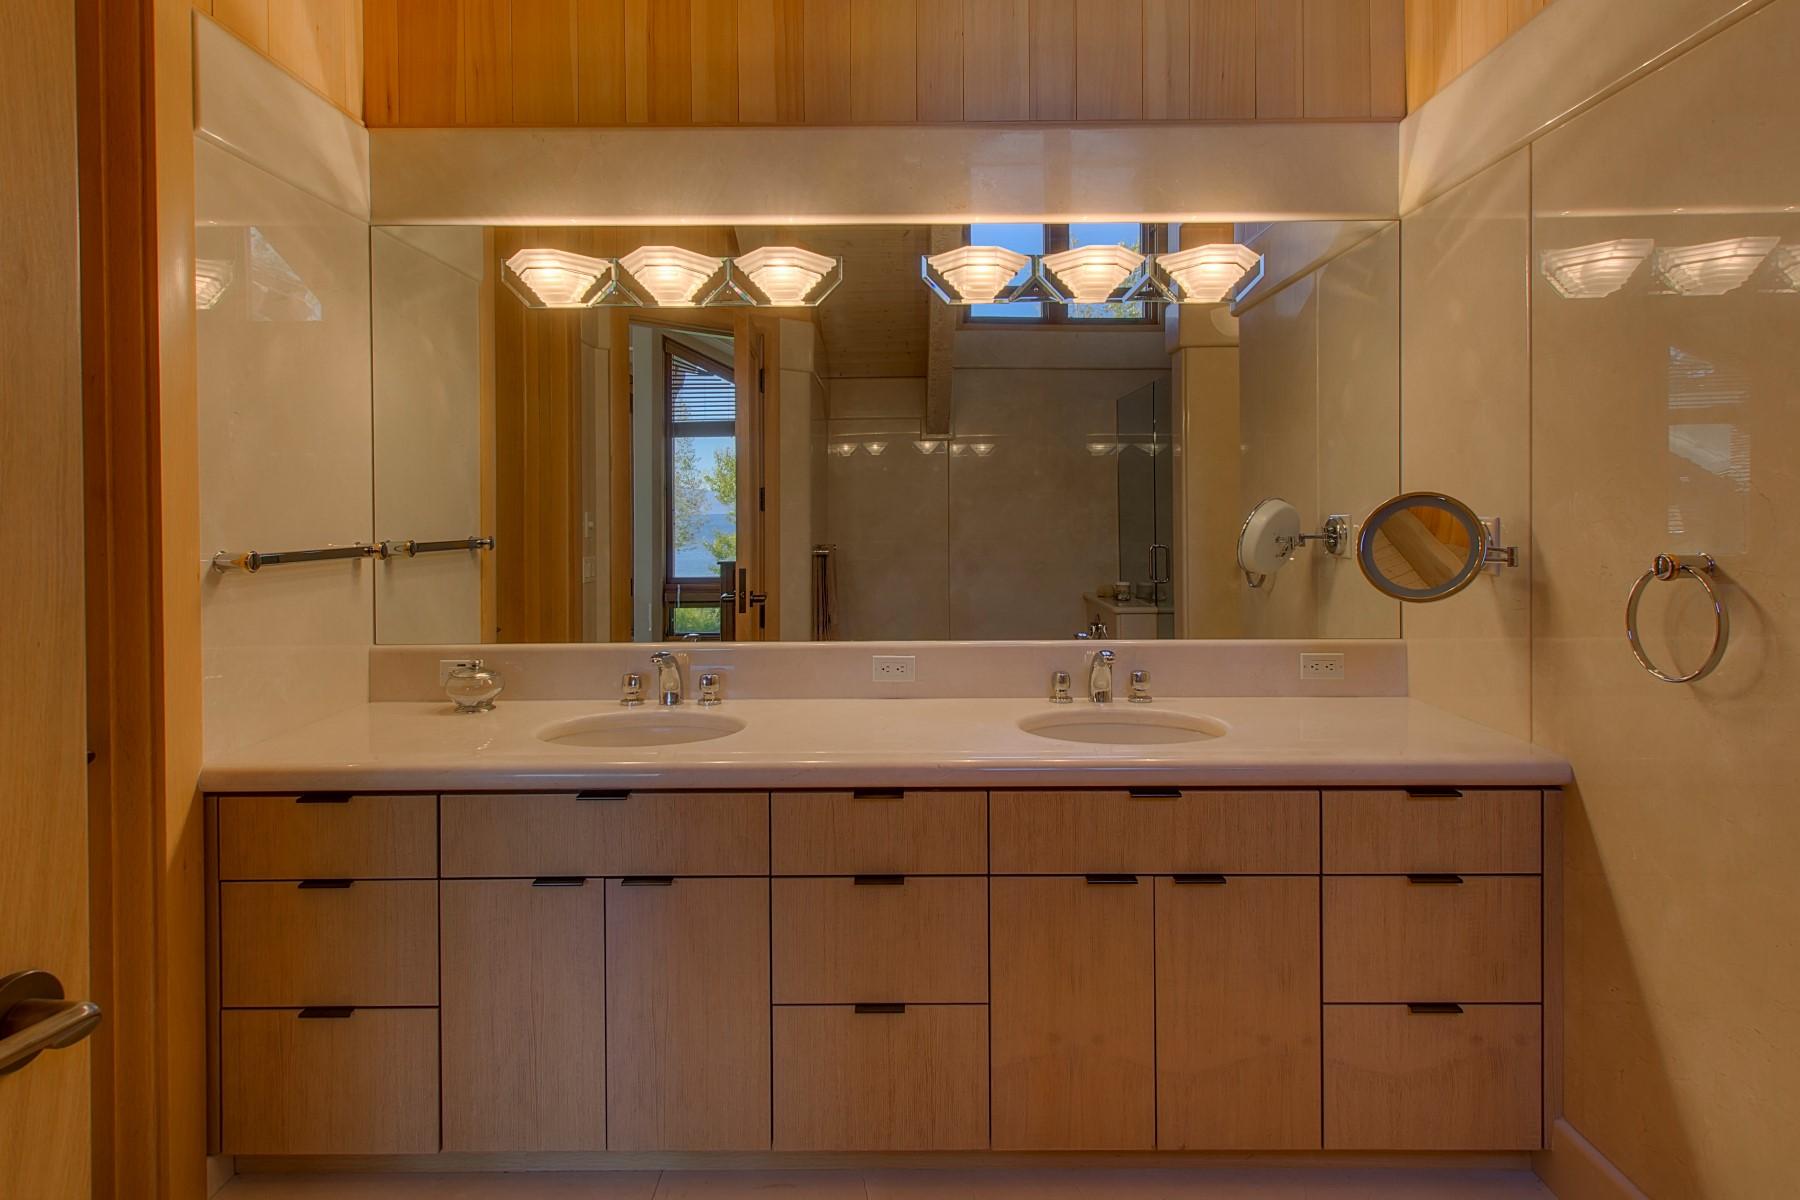 Additional photo for property listing at 4000 West Lake Boulevard #13 Fleur Du Lac Estates 4000 West Lake Boulevard #13 Homewood, California 96141 United States